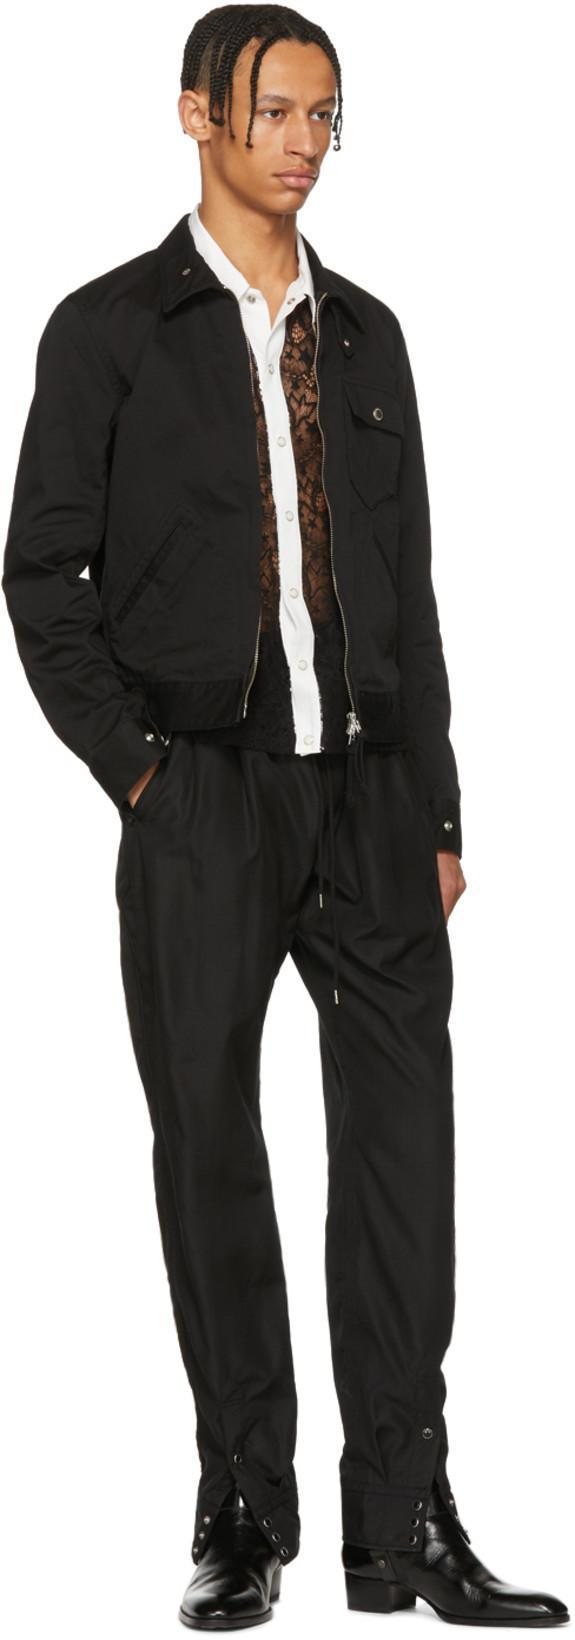 TAKAHIROMIYASHITA THE SOLOIST Takahiromiyashita Thesoloist. Black Fringe Sleeve Shirt in 1 Black